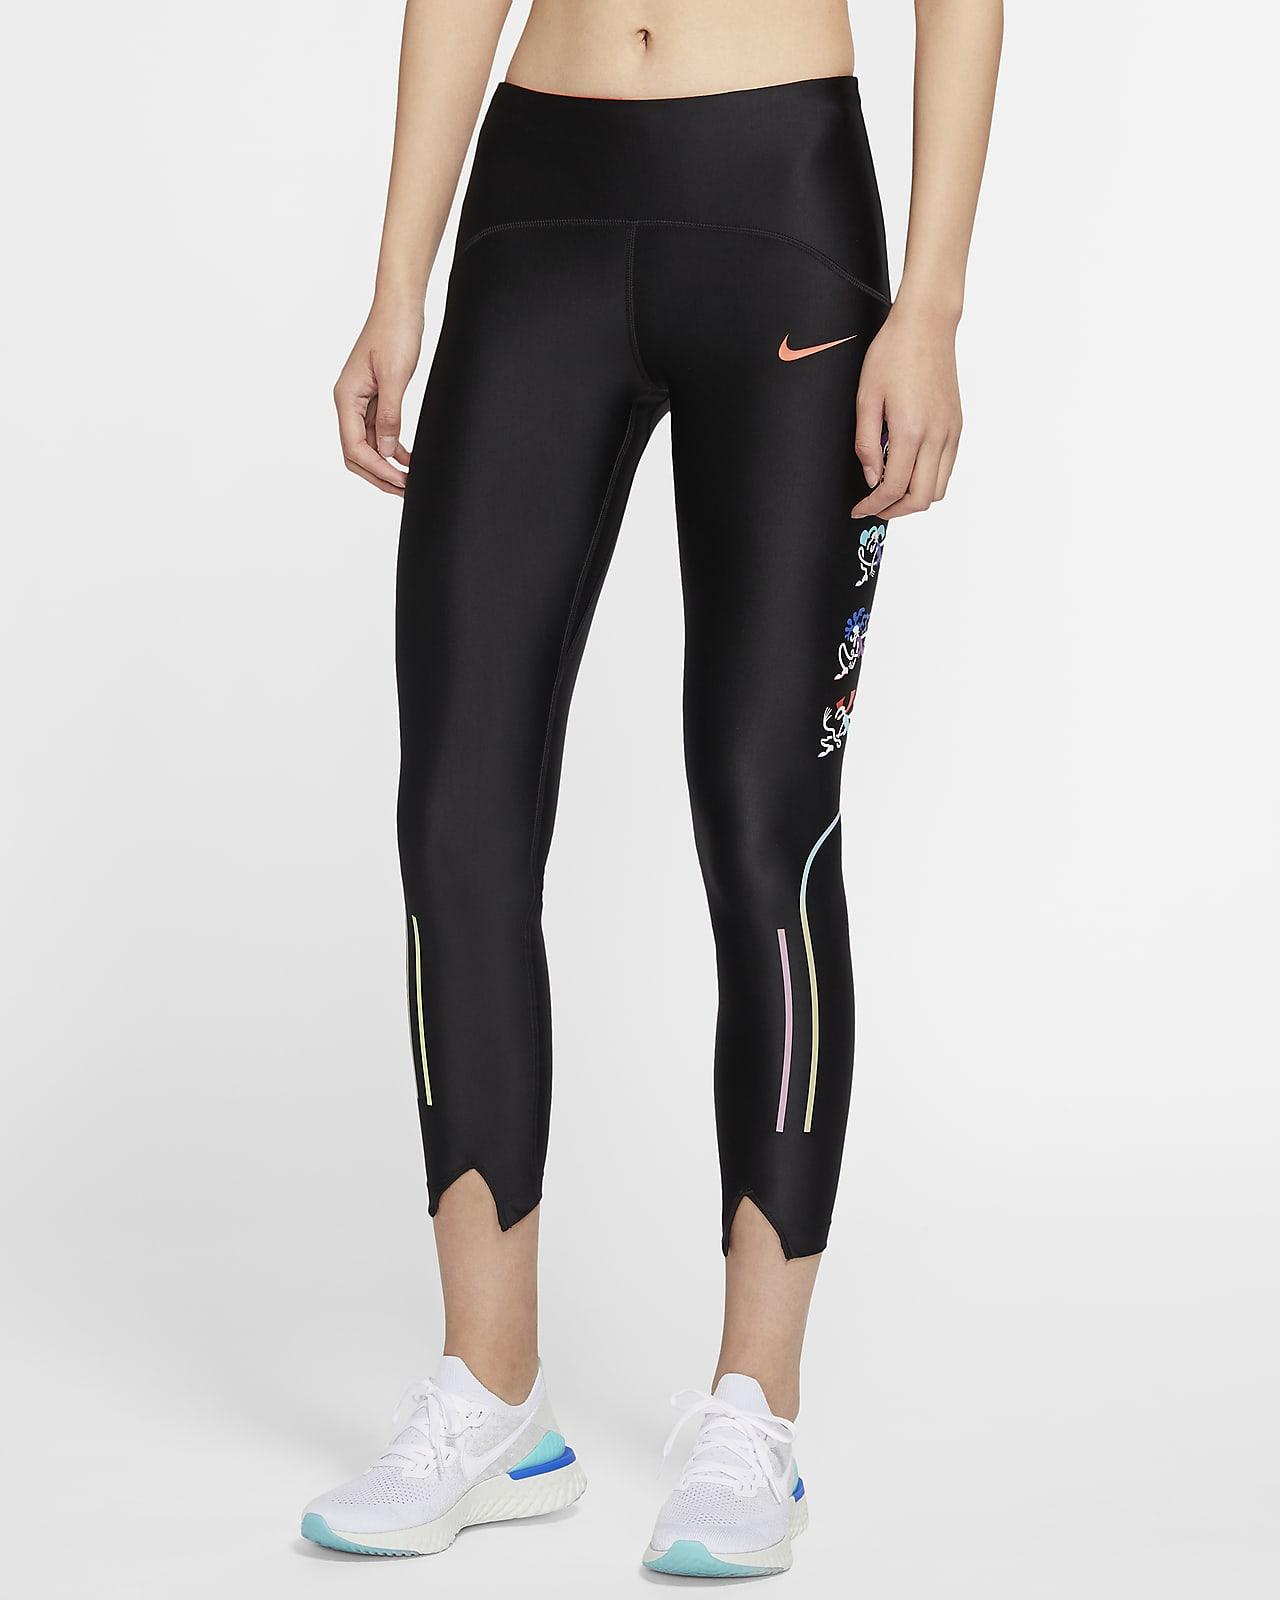 Nike Speed Tokyo 女款九分跑步緊身褲